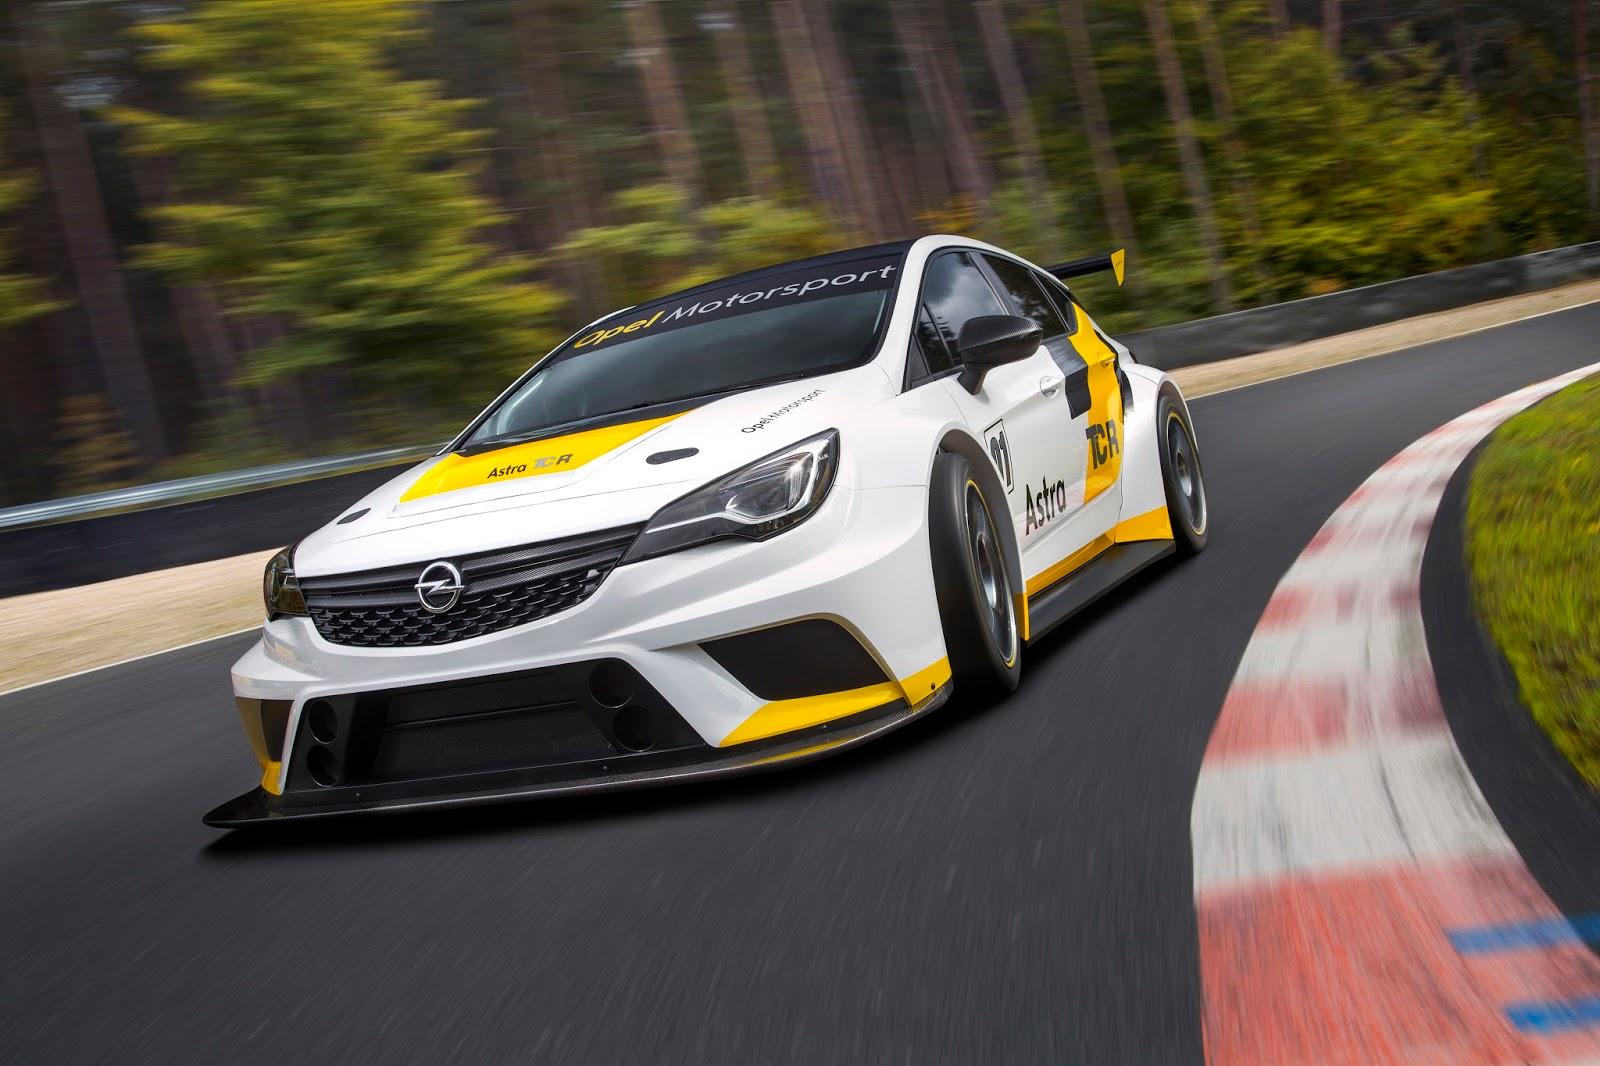 Opel Astra TCR 298091 Opel Astra TCR: Έτοιμο αγωνιστικό για το Nürburgring με 330 άλογα Hatcback, Nurburgring, Opel, Opel Astra, Opel Astra TCR, Rally